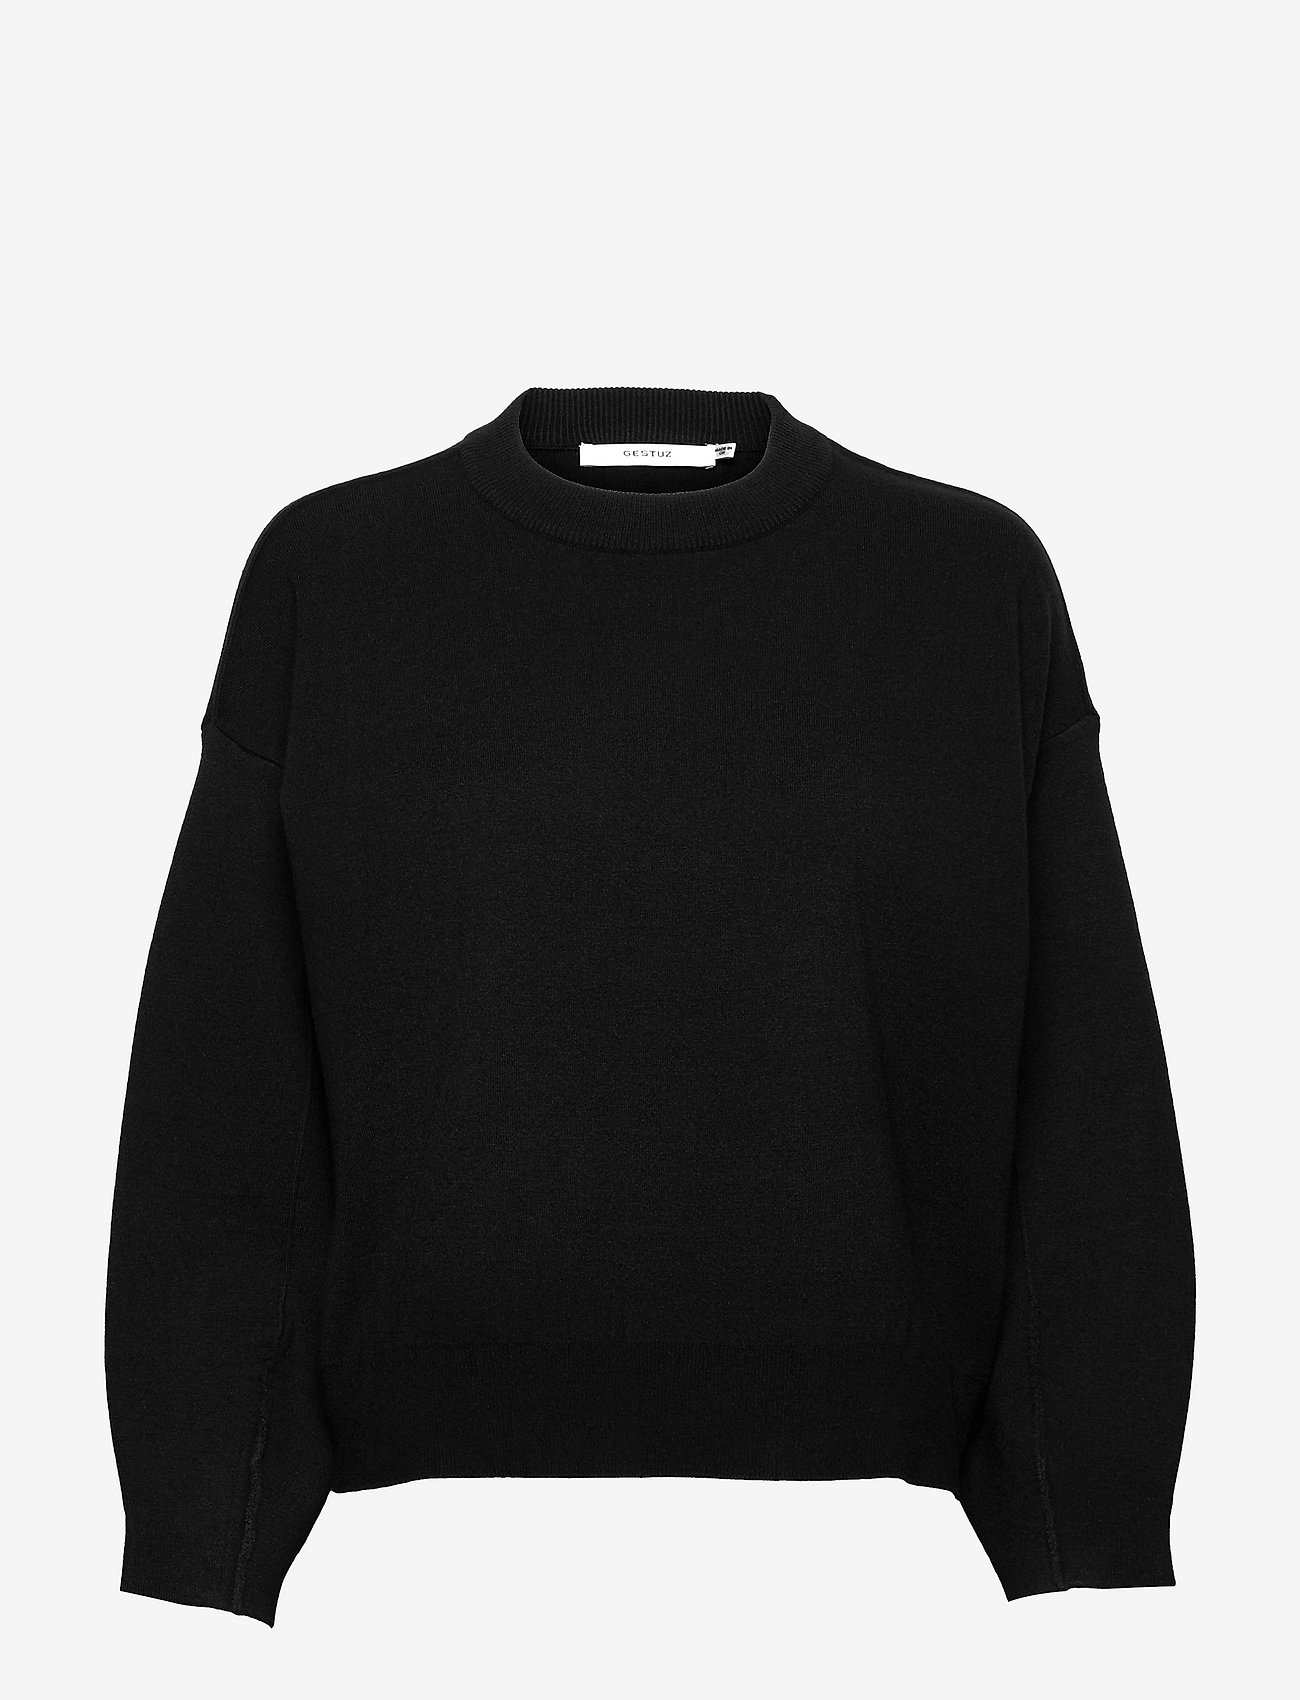 Gestuz - TalliGZ pullover NOOS - trøjer - black - 0